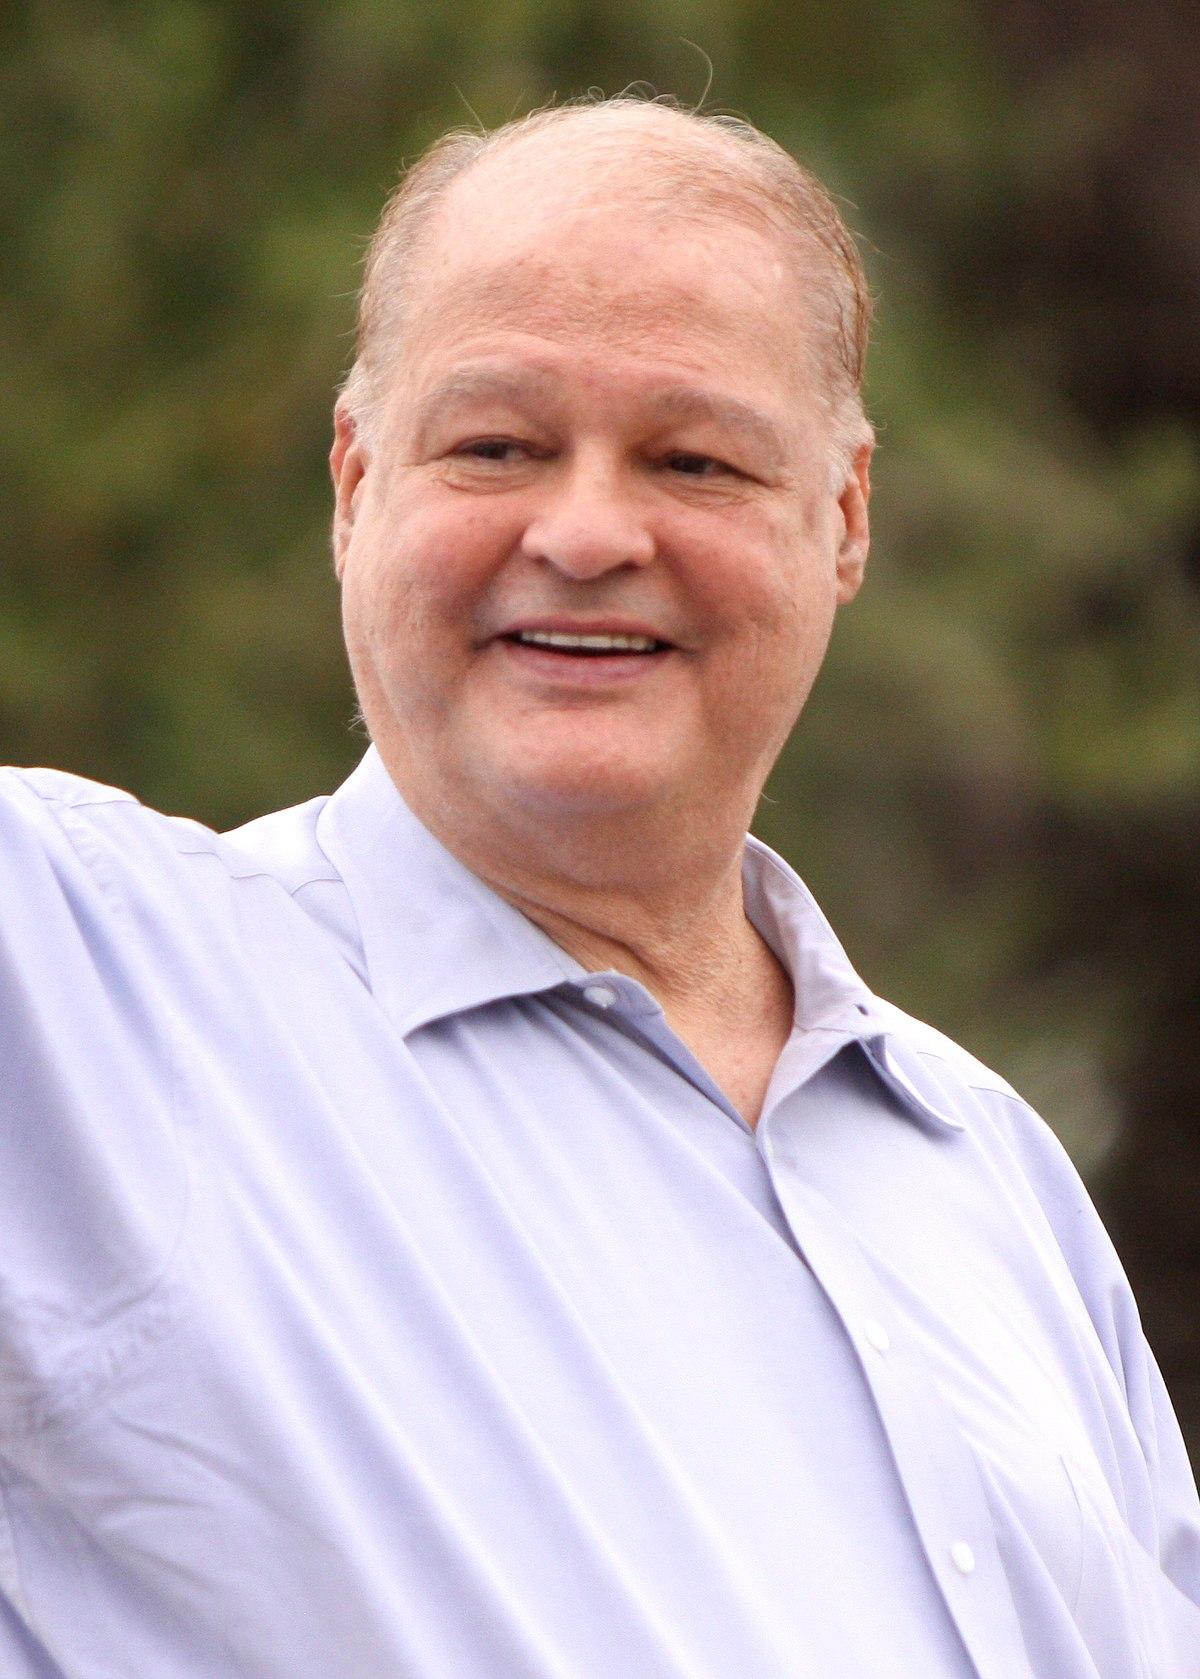 Arizona State Representatives >> Tom Horne - Wikipedia